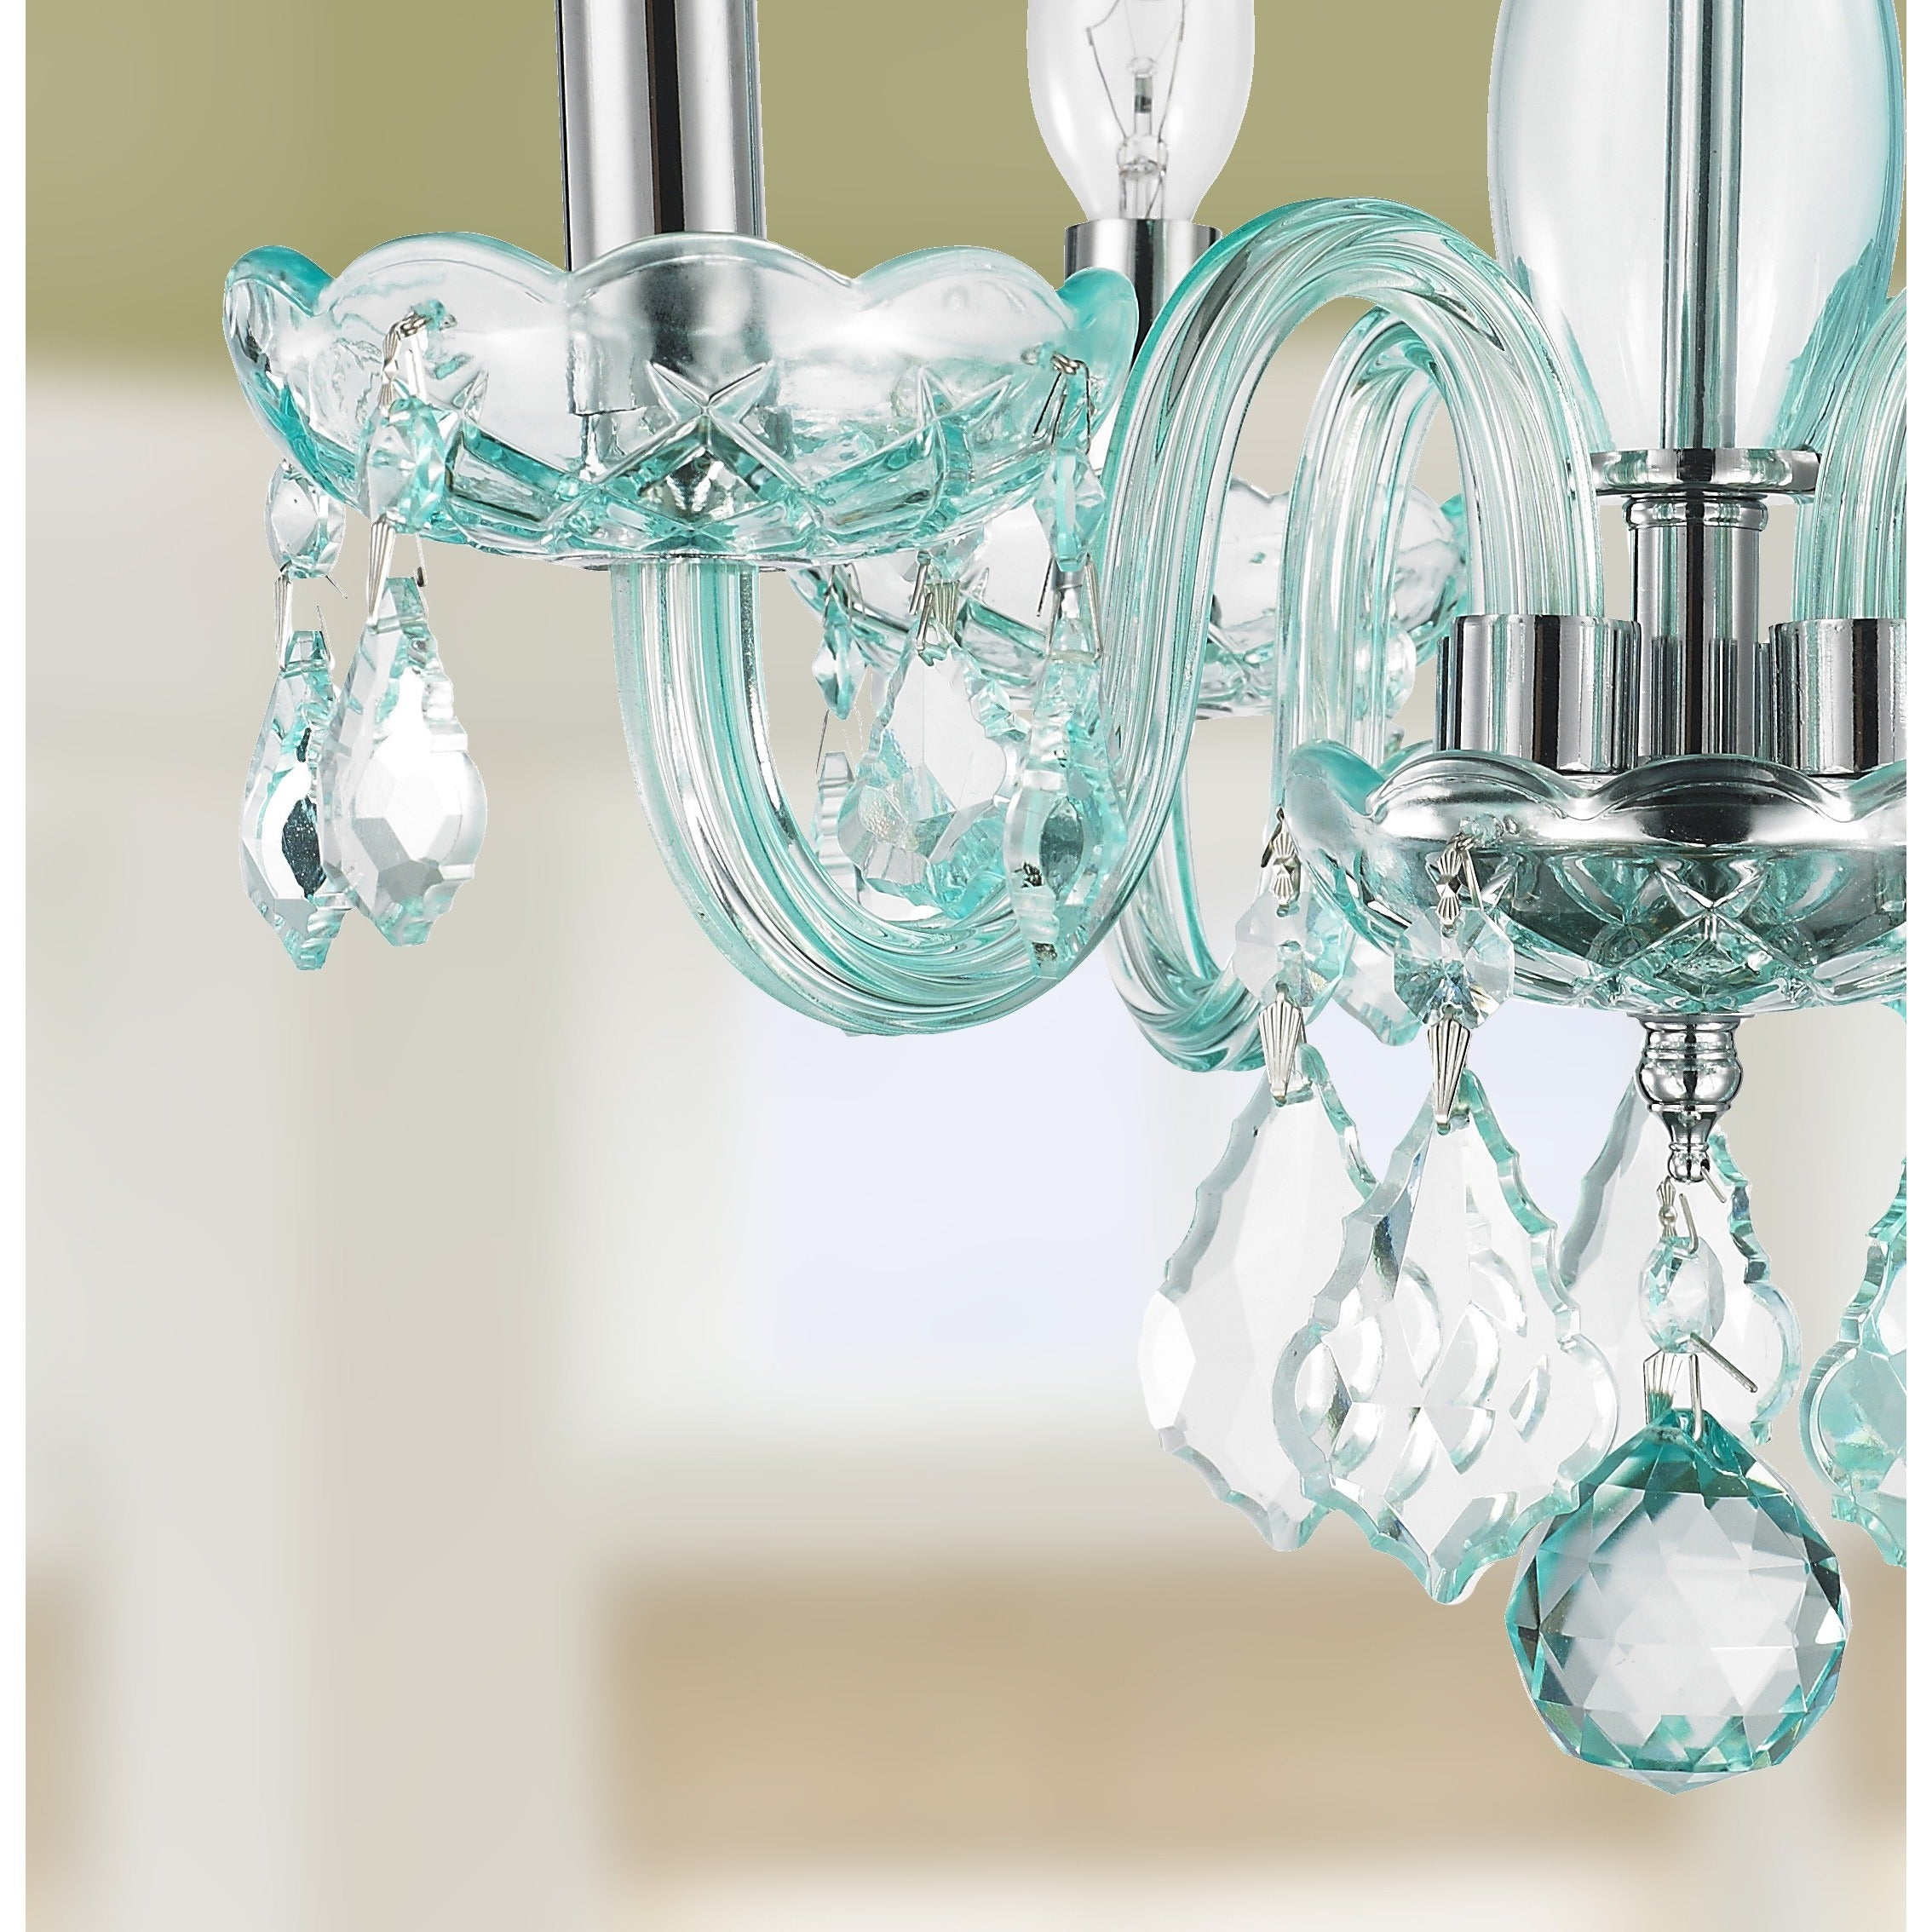 turquoise chandelier lighting. Kids Room Glamorous 4-light Full Lead Turquoise Blue Crystal Chandelier - Free Shipping Today Overstock.com 17252206 Lighting T